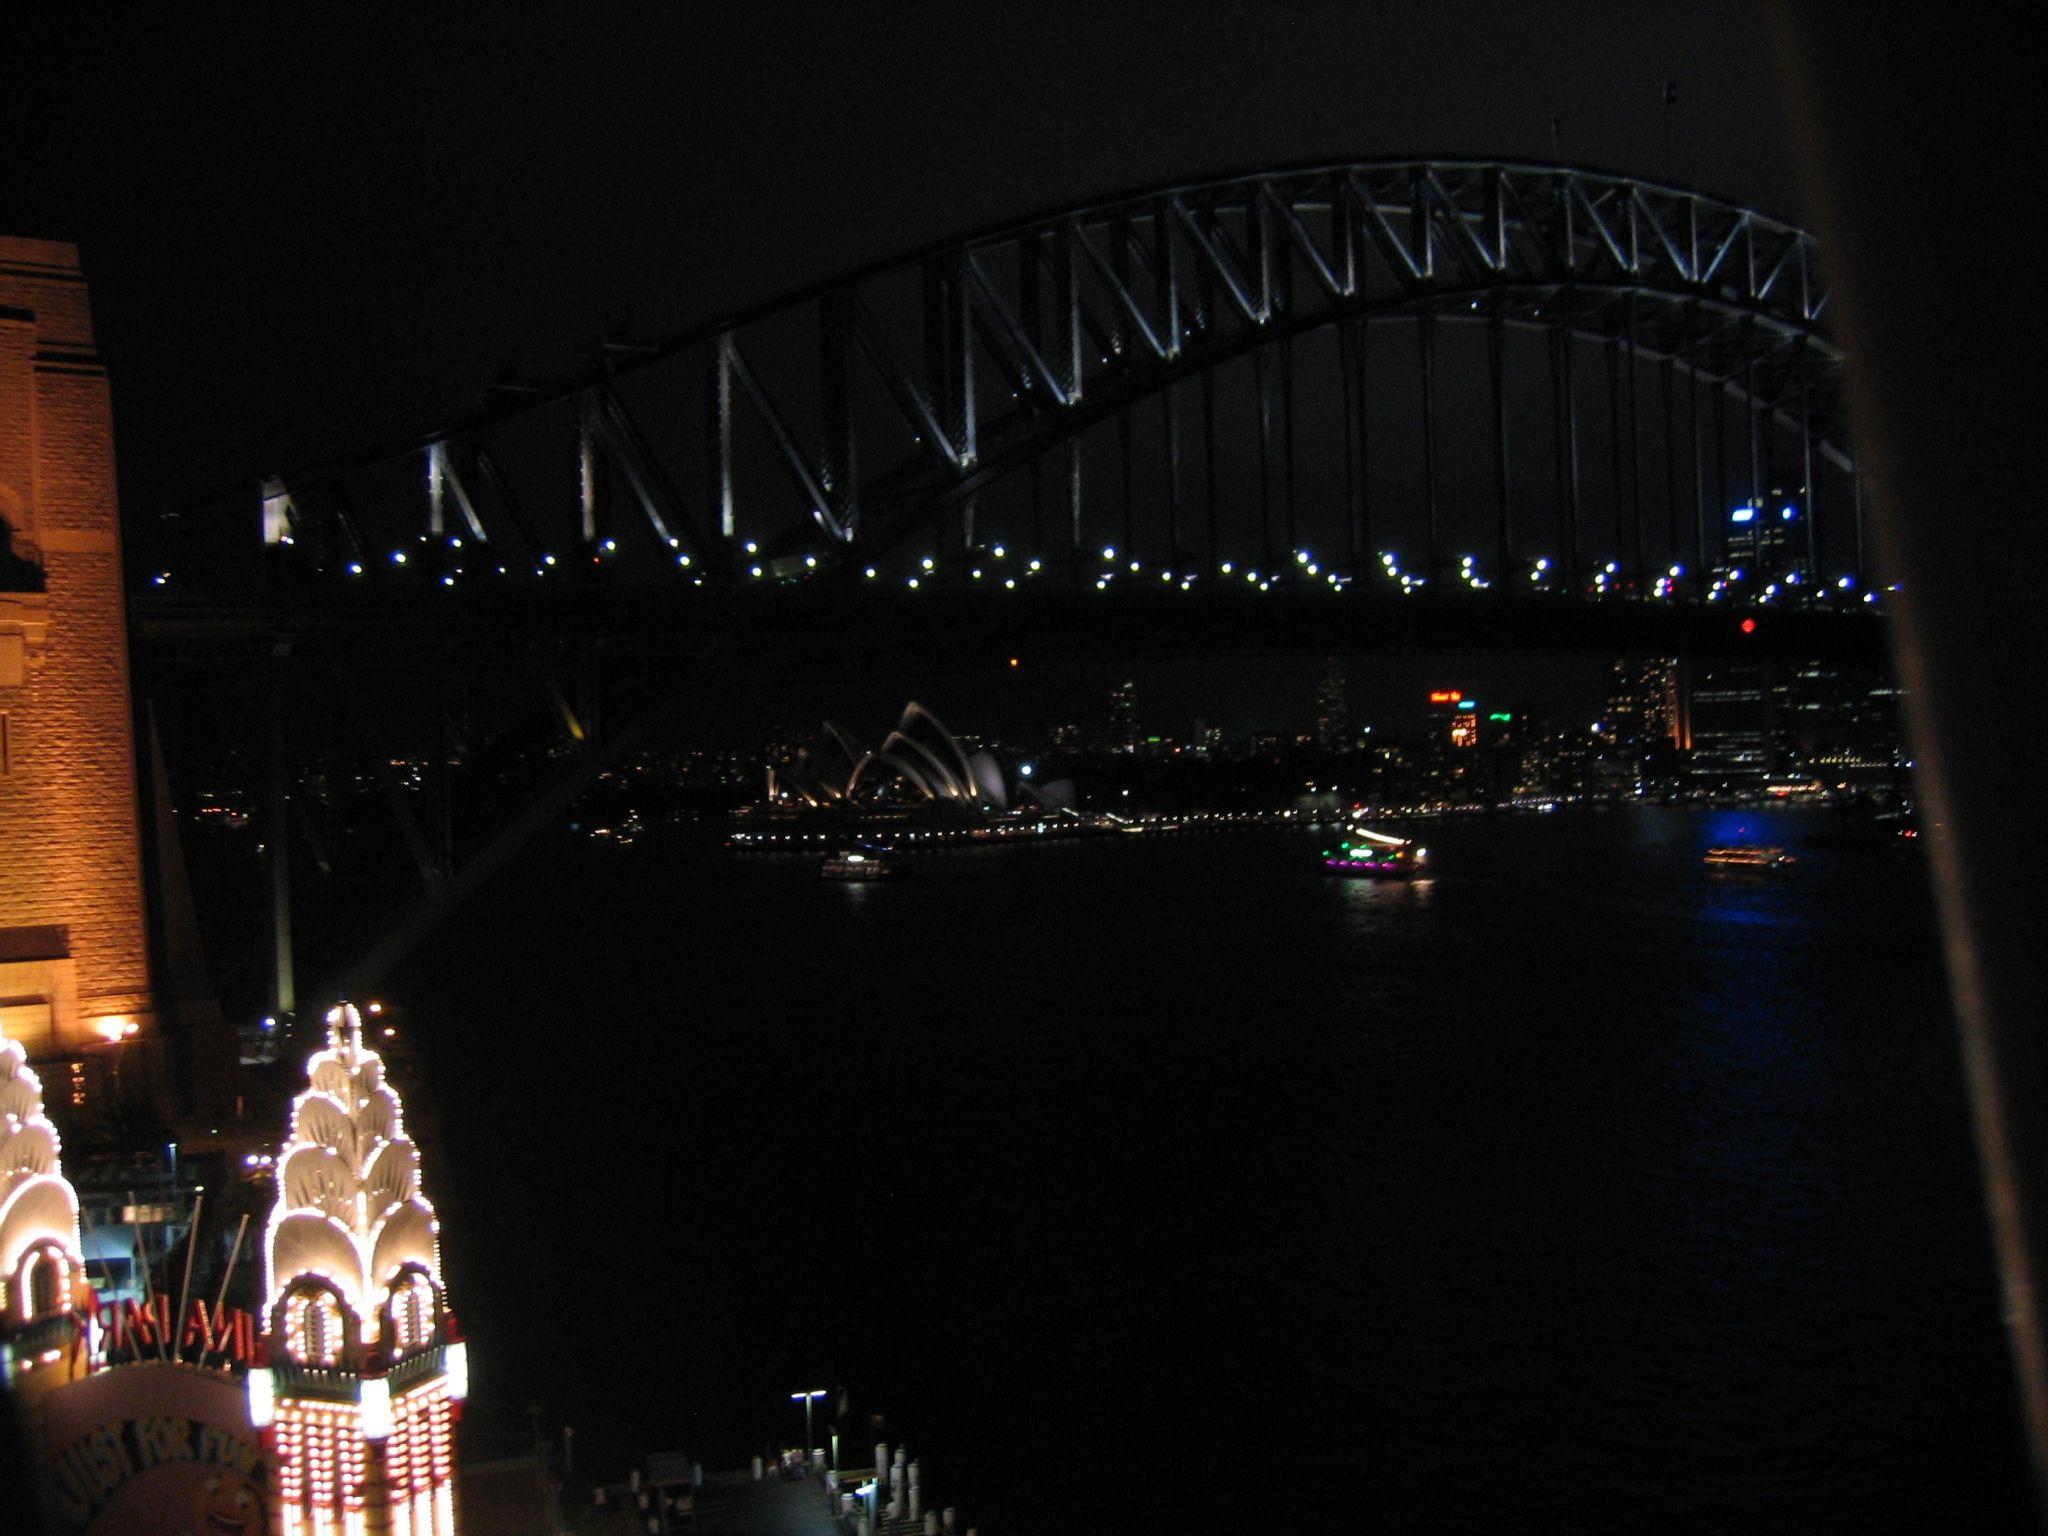 Another very dark photo of Sydney Harbour Bridge taken from atop a ferris wheel.